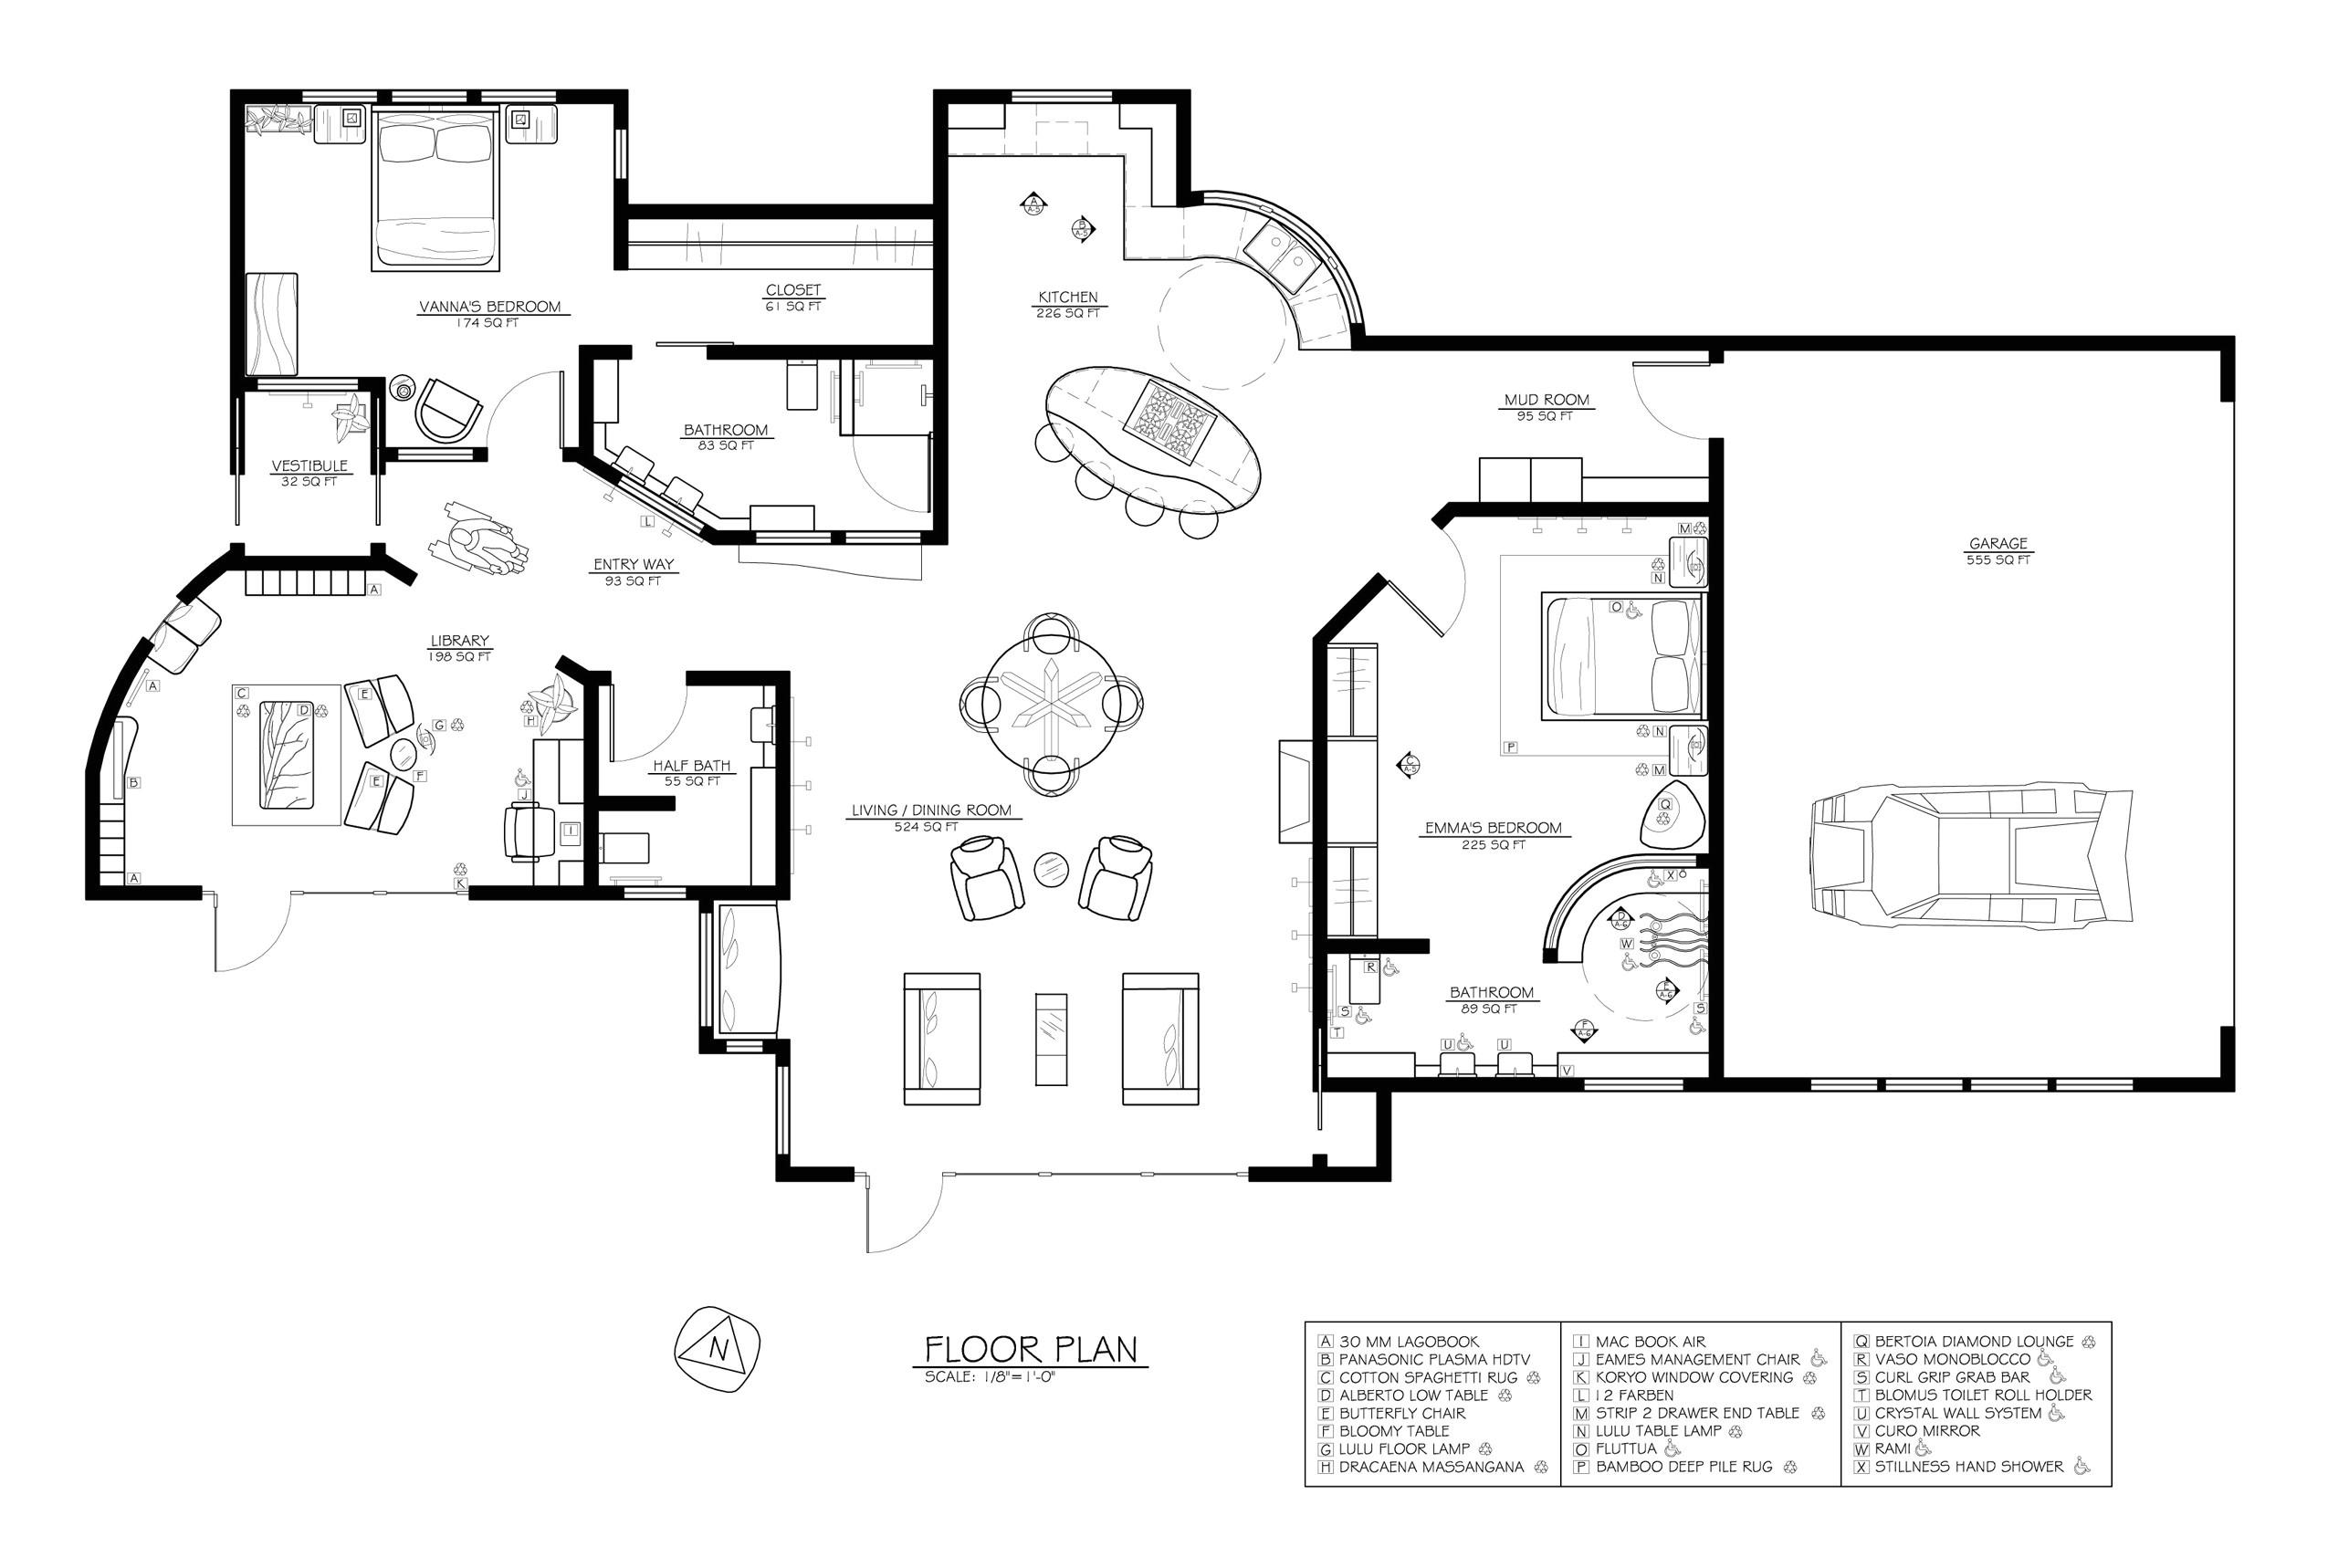 Solar Home Plans solar Home Floor Plans Find House Plans